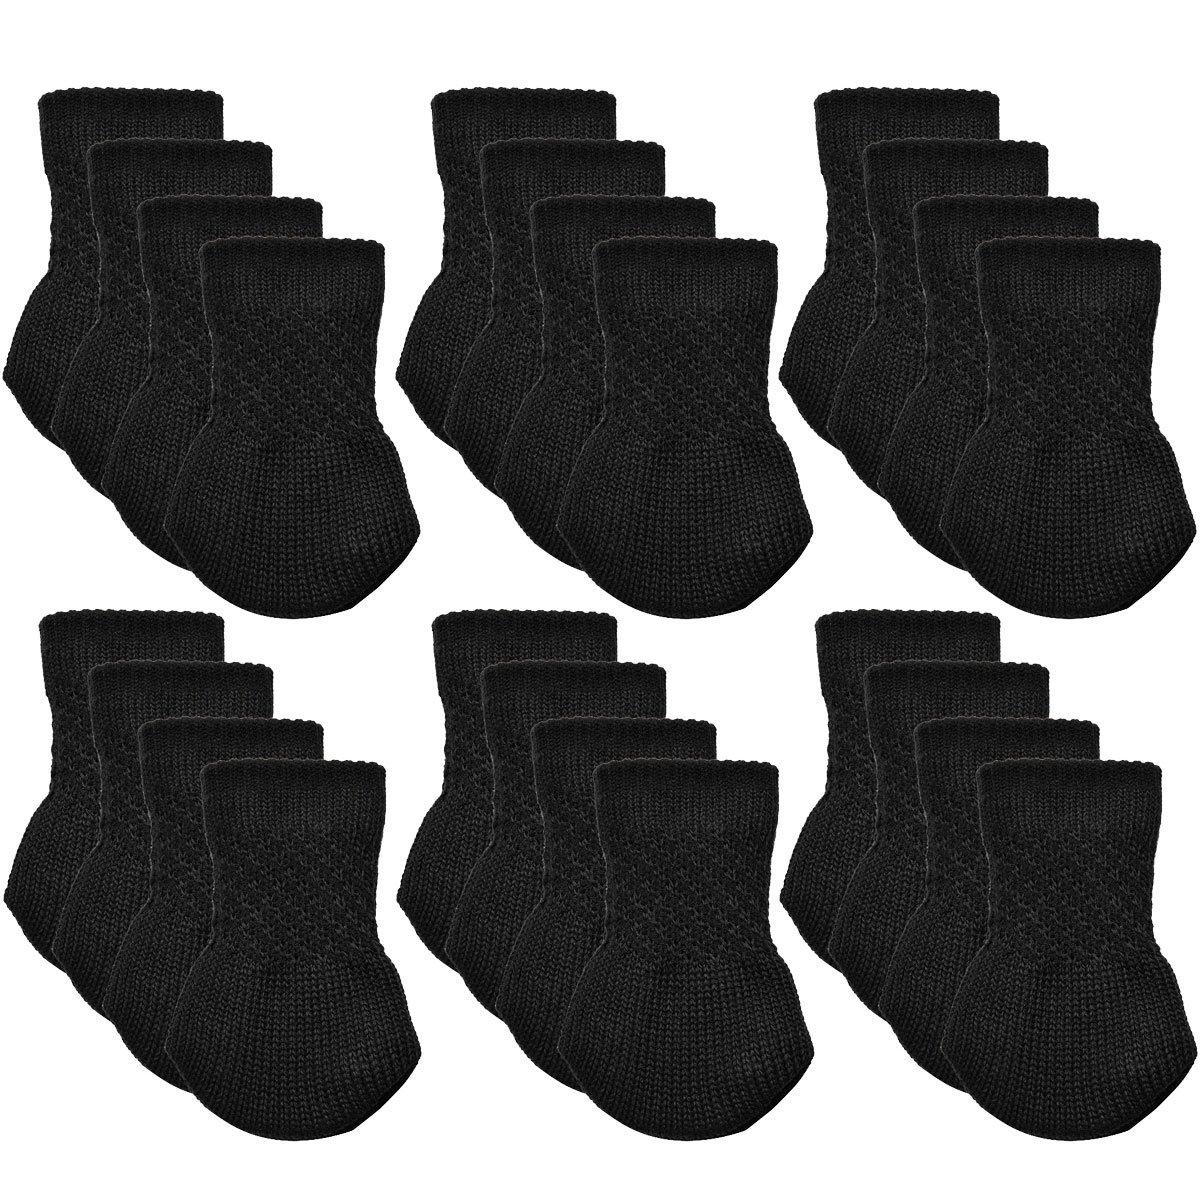 Chair Socks, Outgeek 24 Pack Knitted Furniture Feet Socks Chair Leg Floor Protectors (Black)